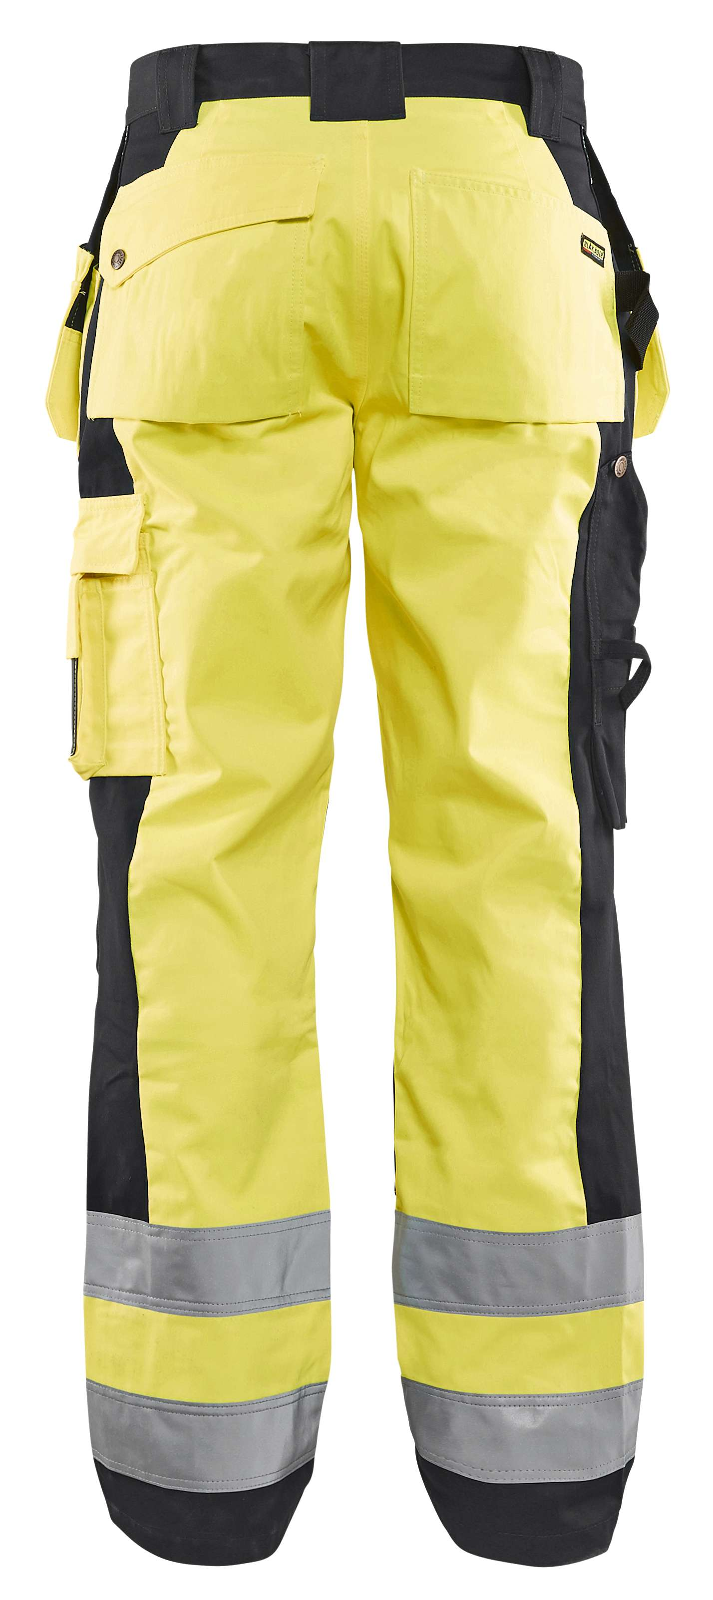 Blaklader Werkbroeken 15331860 High Vis geel-zwart(3399)